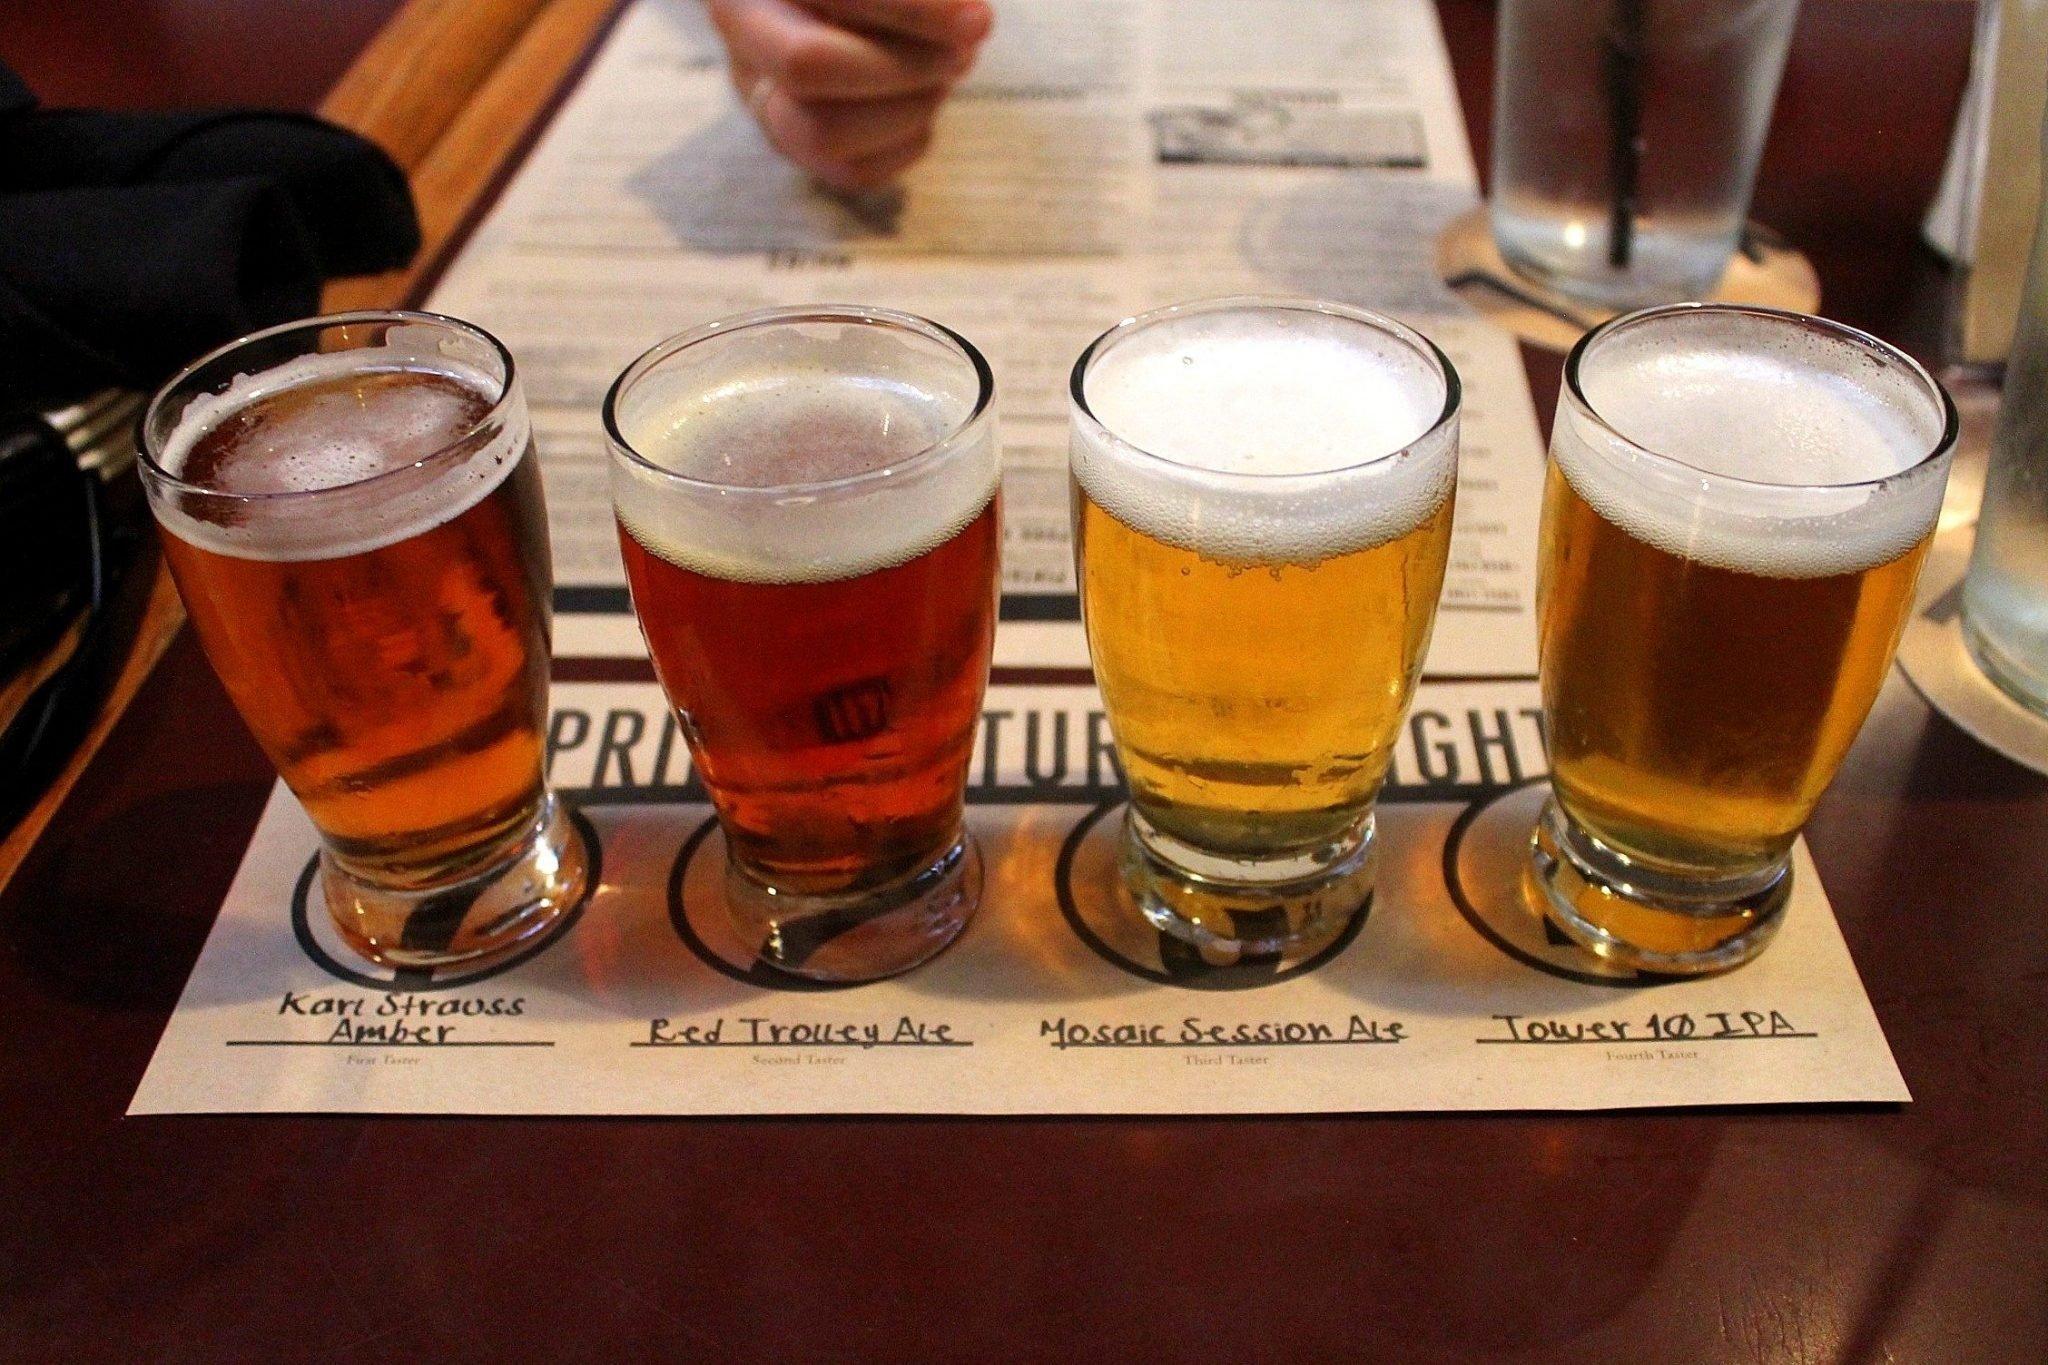 Karl Strauss Brewery - San Diego, California - California Breweries